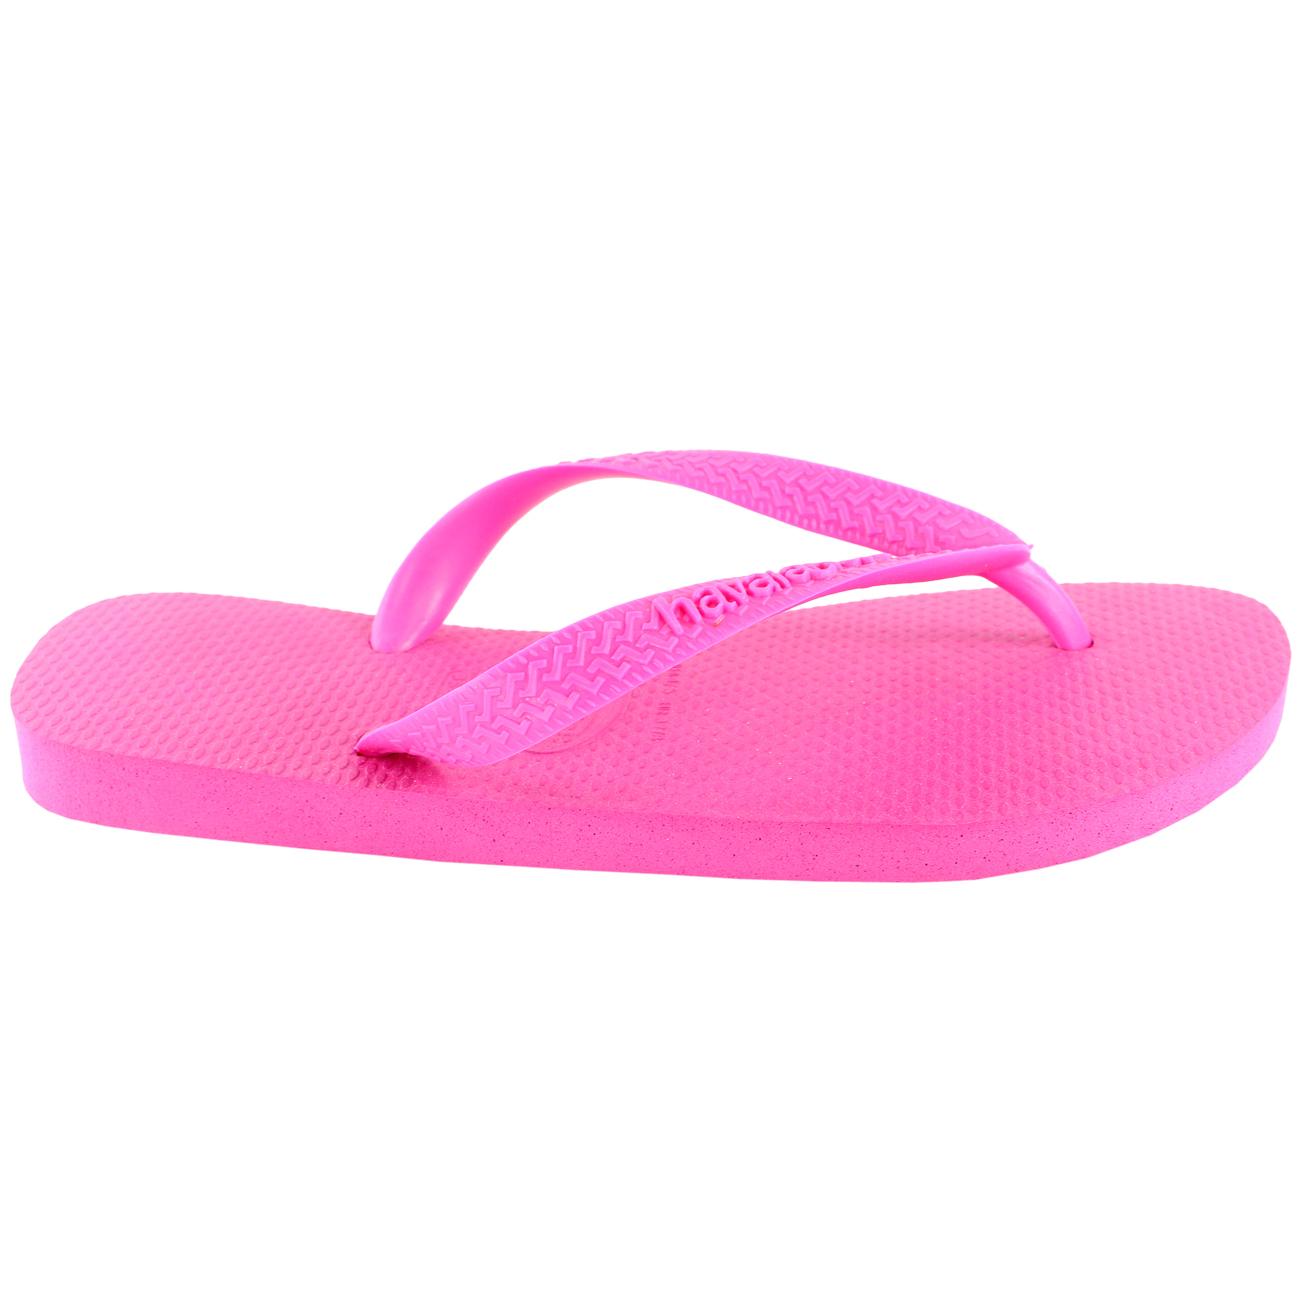 Ladies Havaianas Top Holiday Beach Flip Flops Summer ...